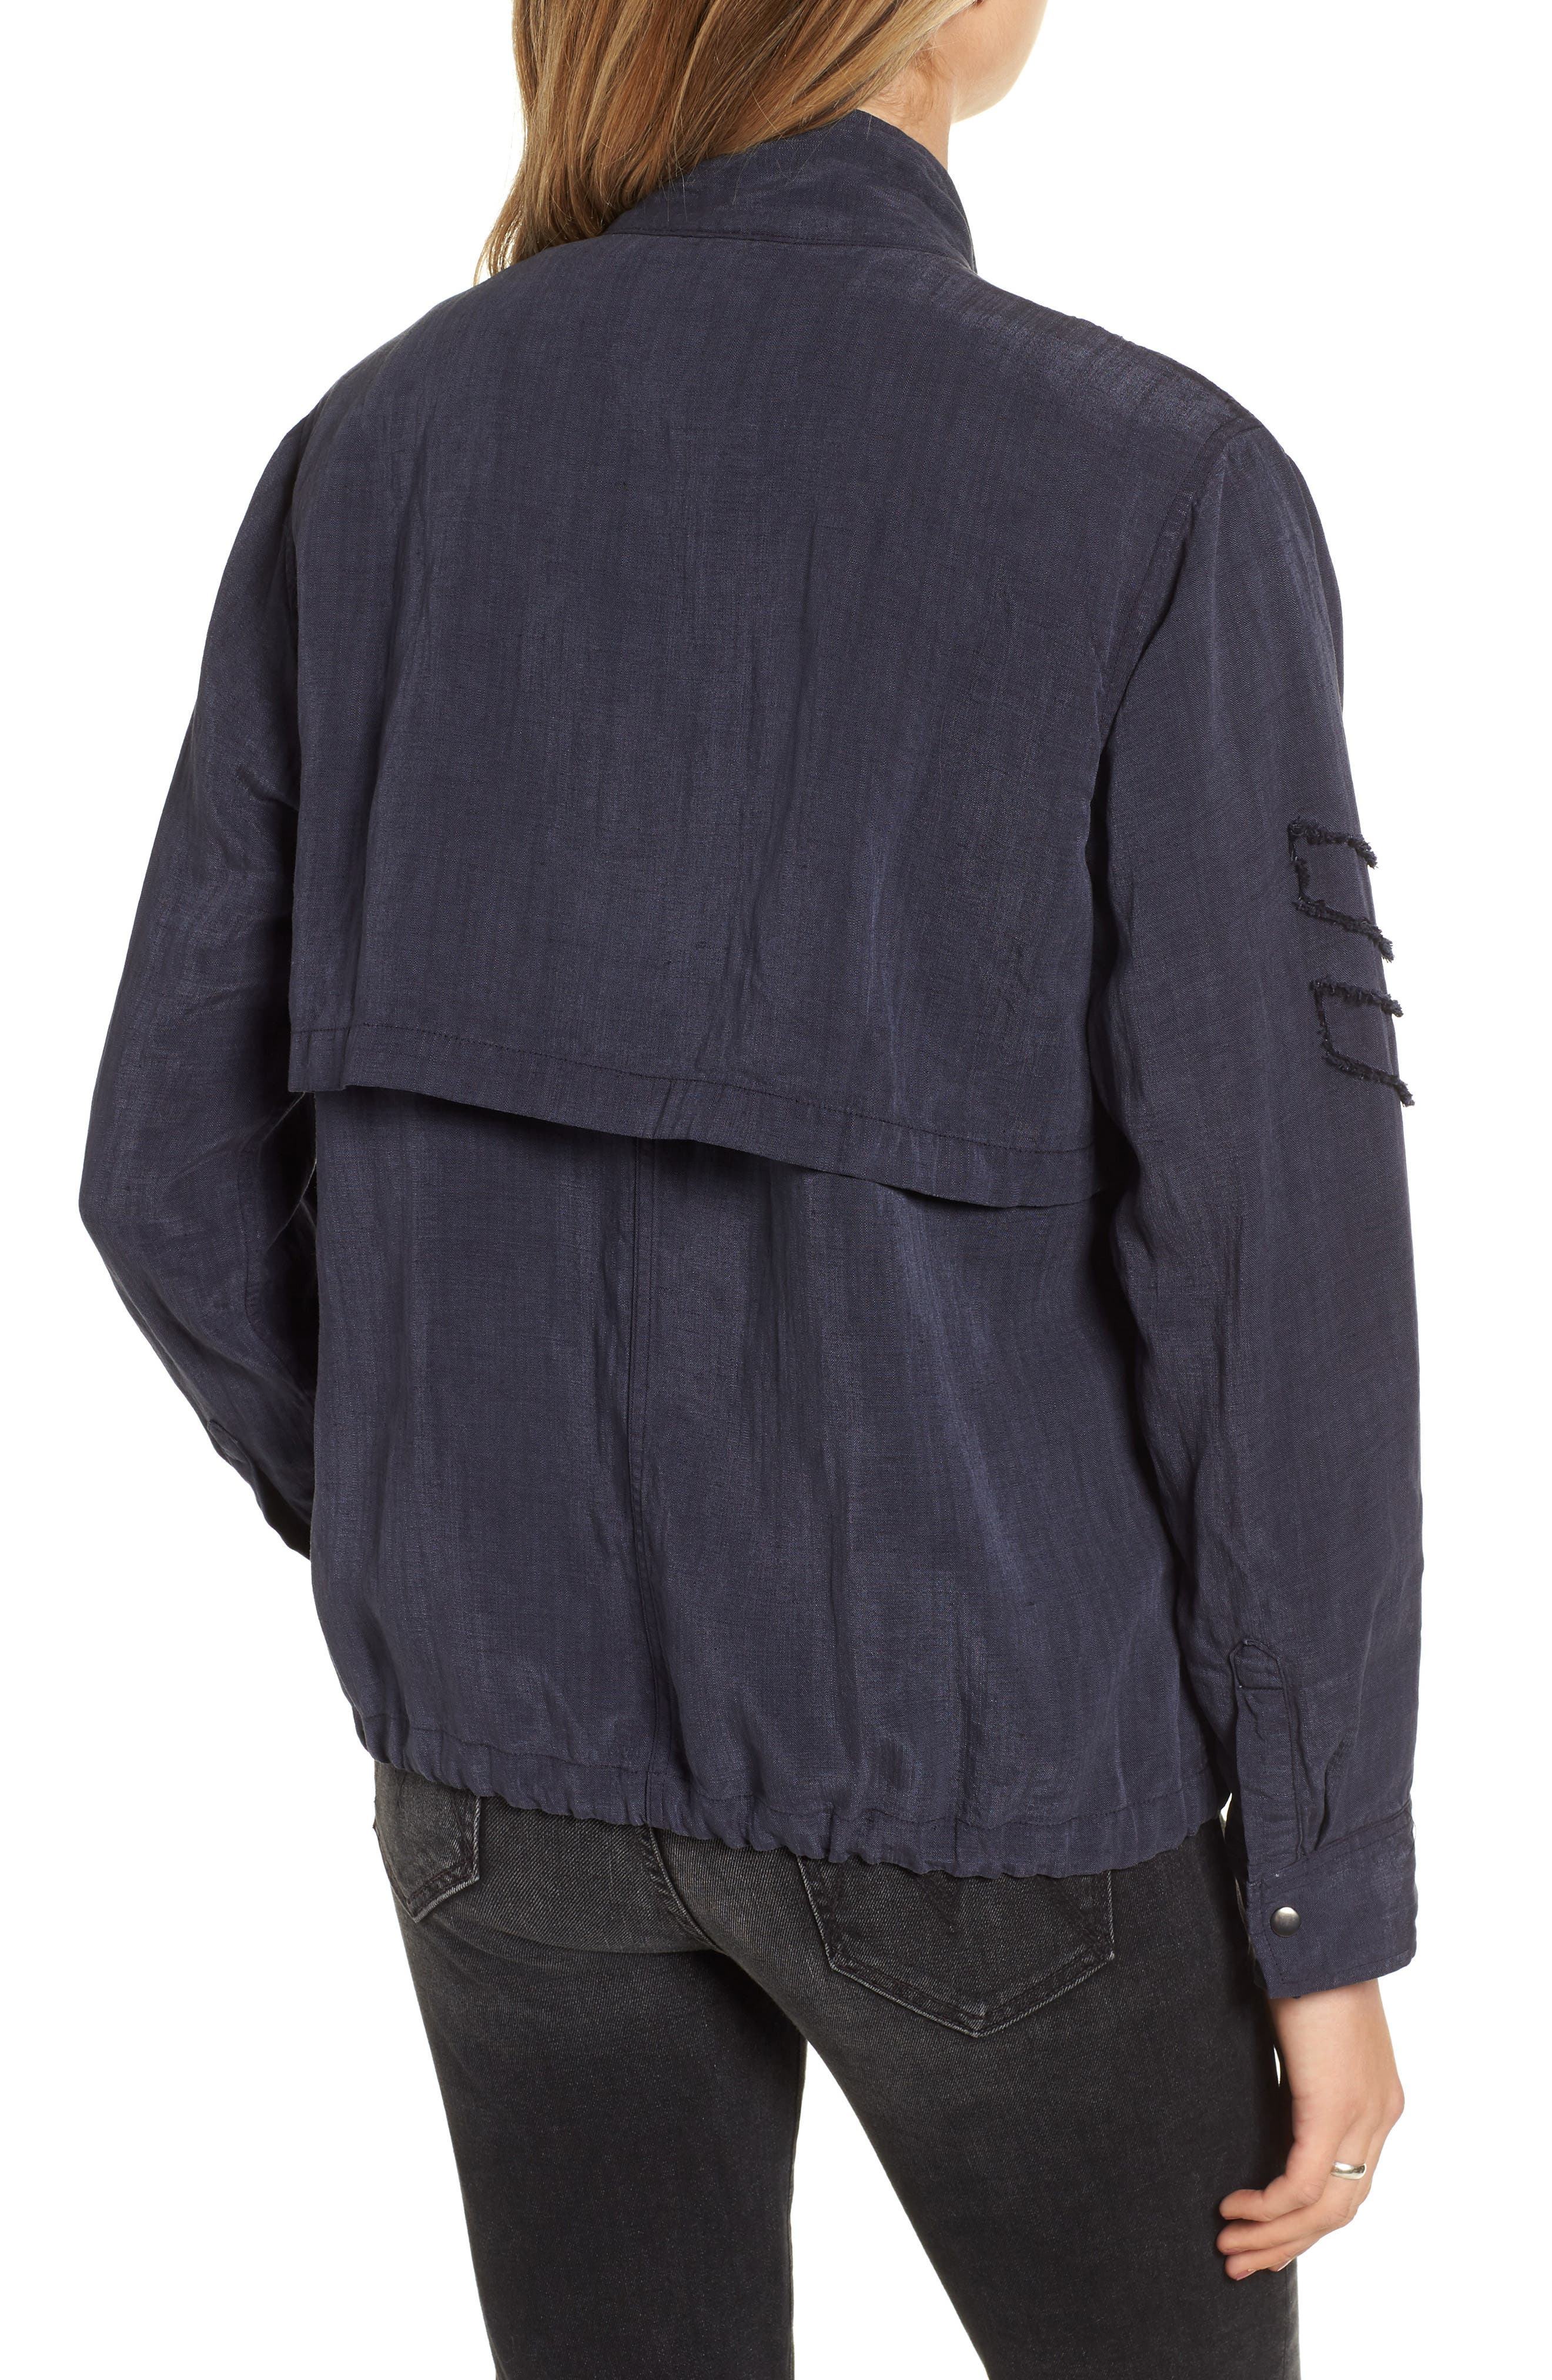 Halifax Drawstring Jacket,                             Alternate thumbnail 2, color,                             410